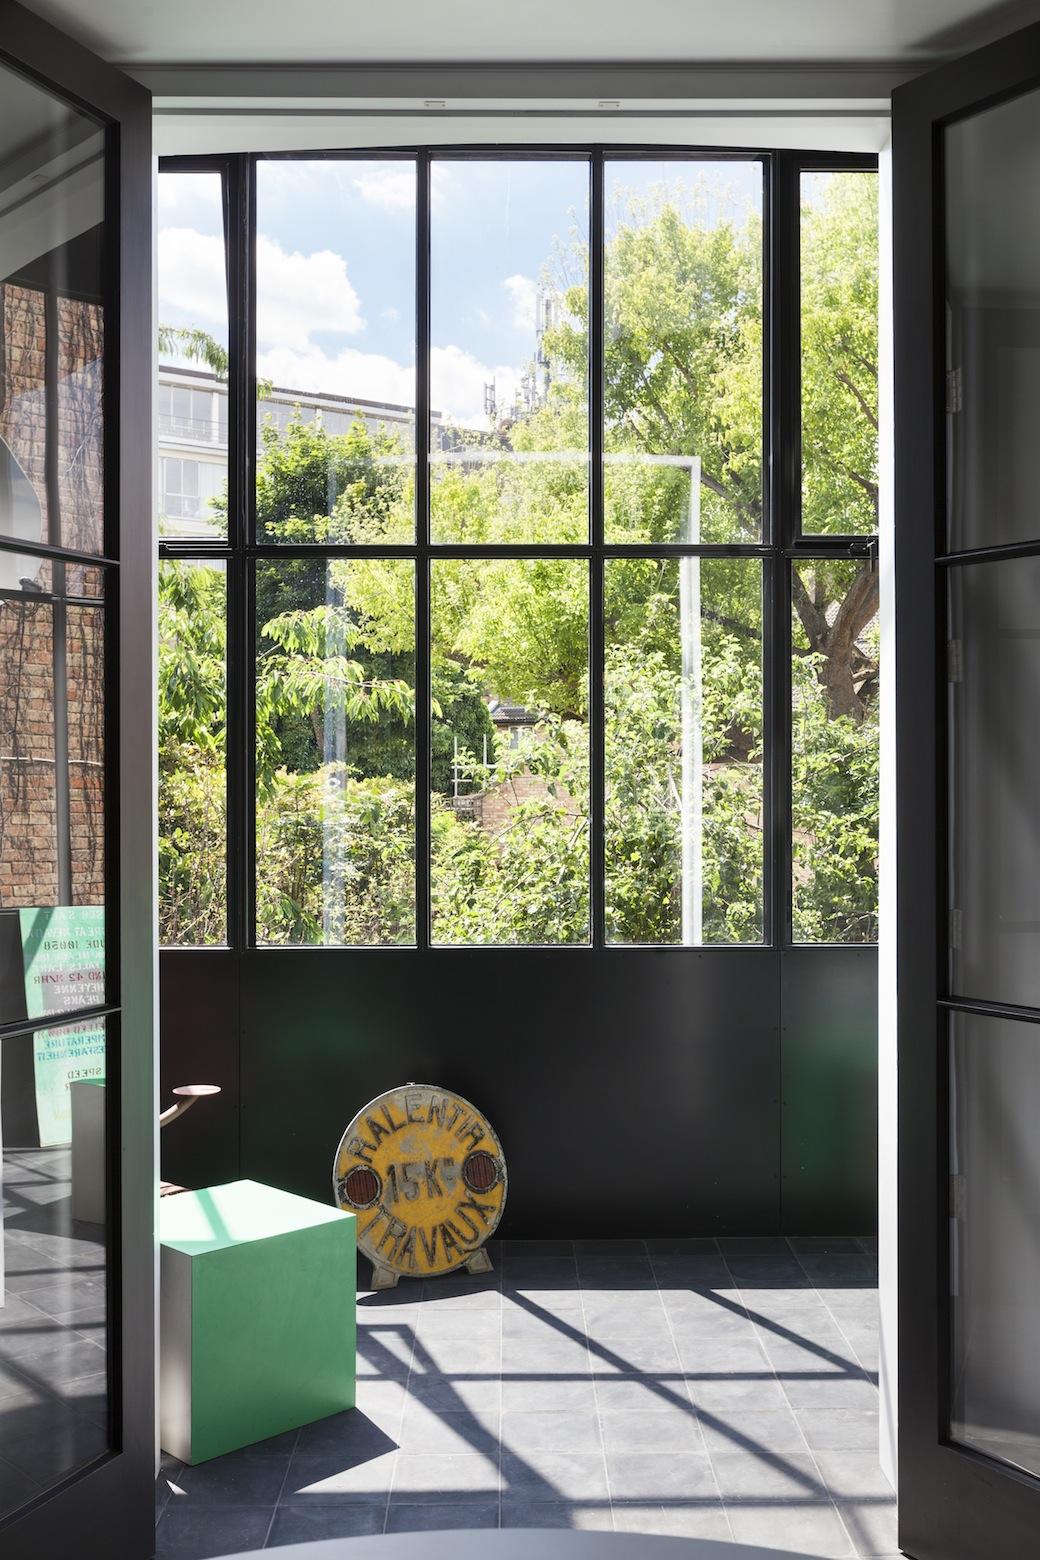 Domus-Nova-Park-Street-London-property-283